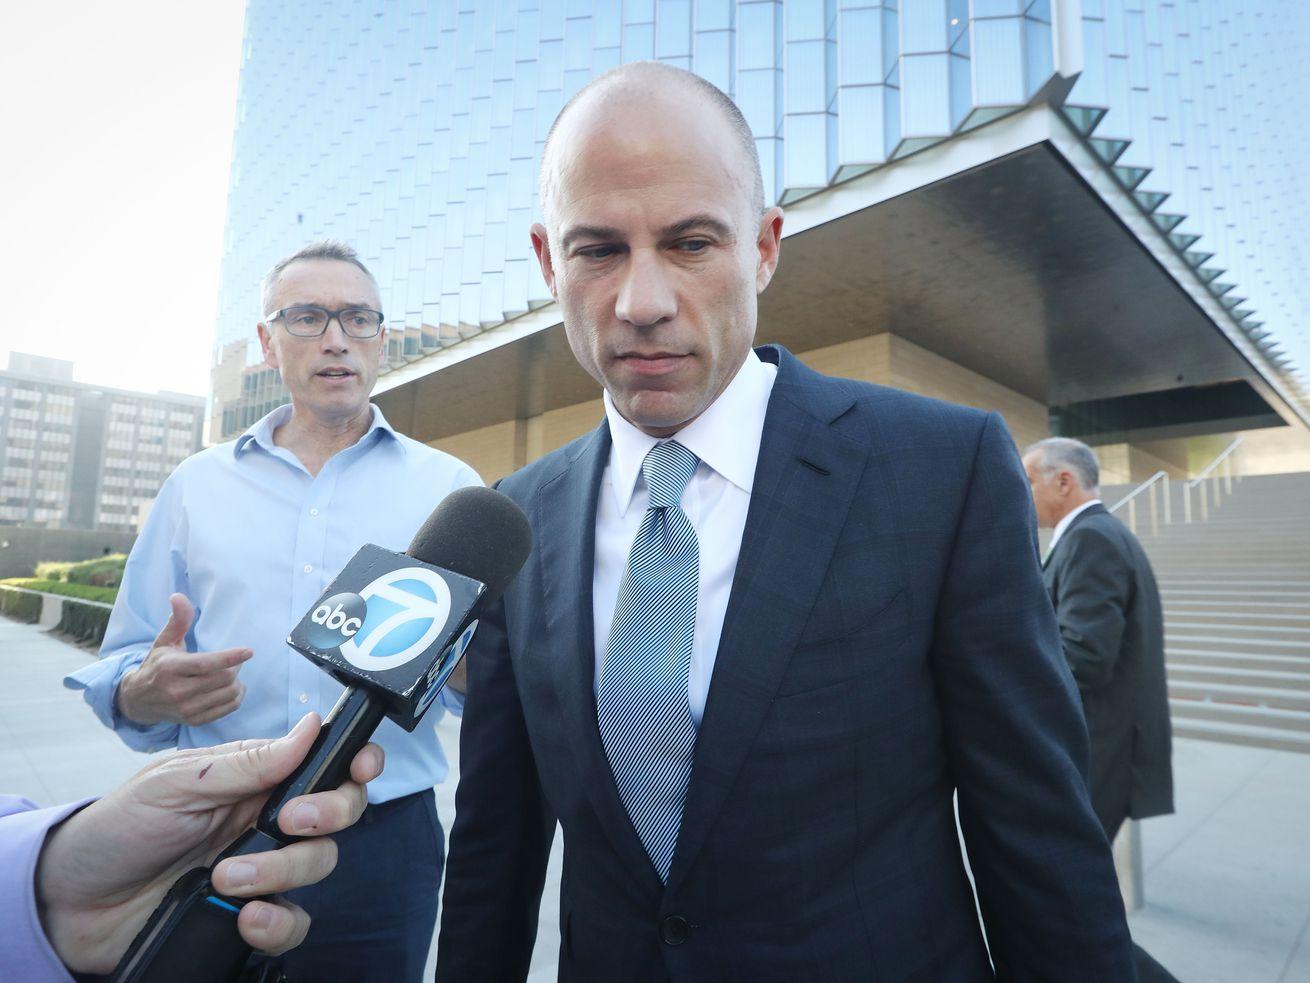 Michael Avenatti outside a California courtroom in September 2018.